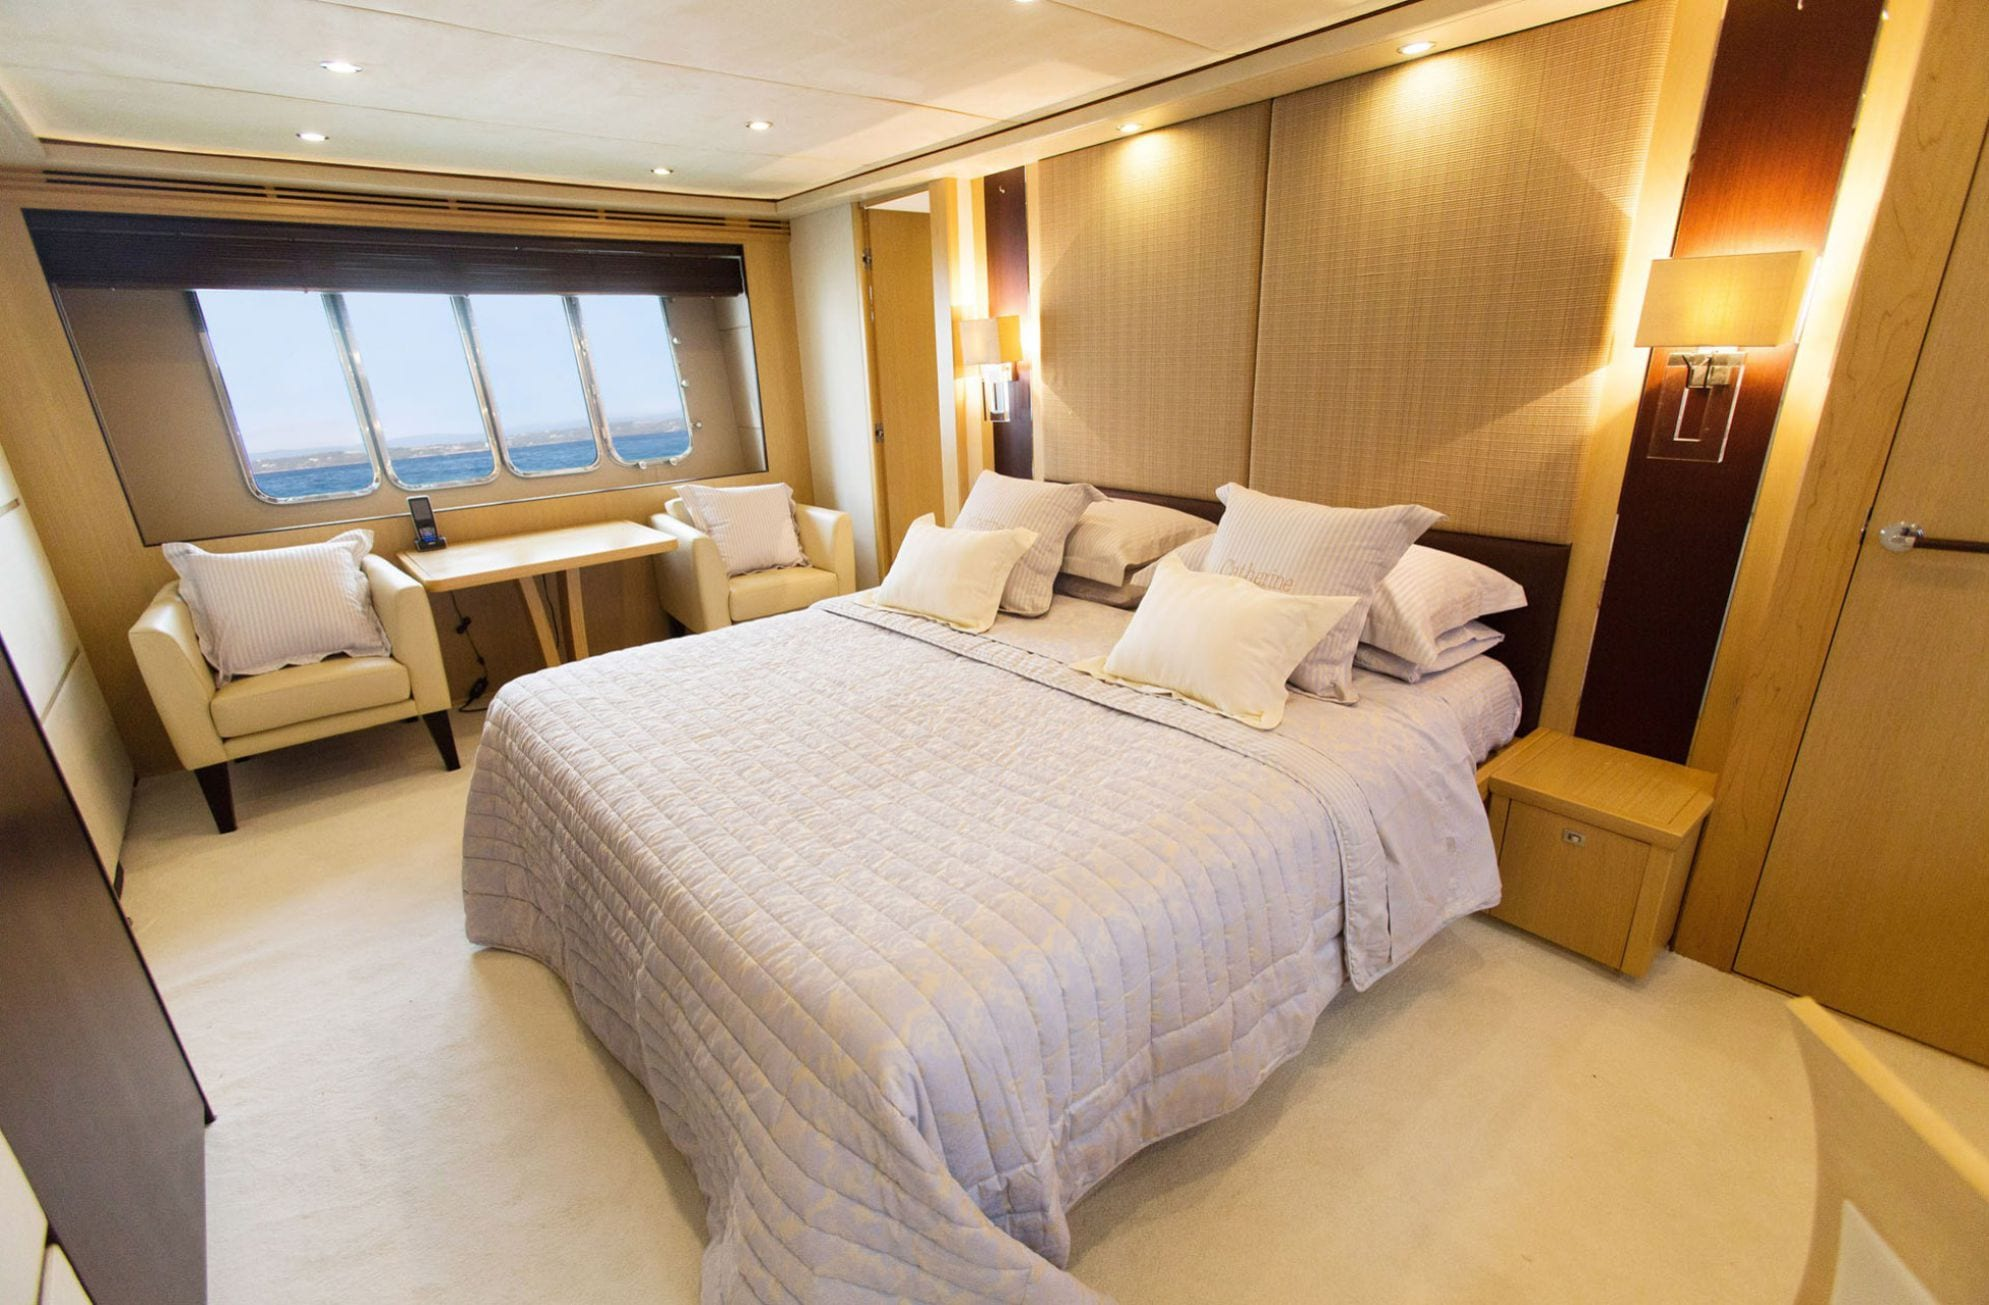 catherine motor yacht master stateroom (1)_valef -  Valef Yachts Chartering - 5175